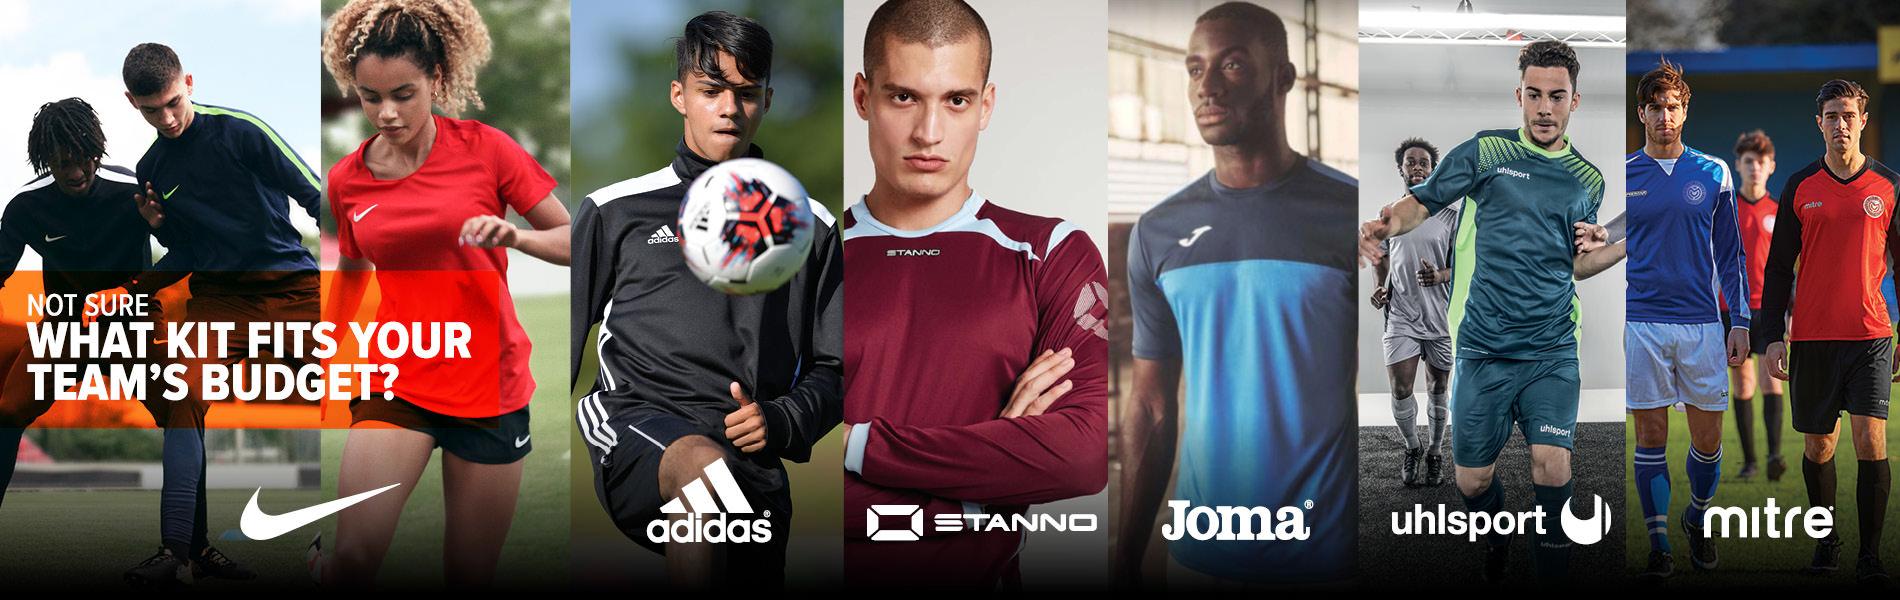 003c4d76d89 Direct Soccer | Football Kits | Football Equipment | Footballs